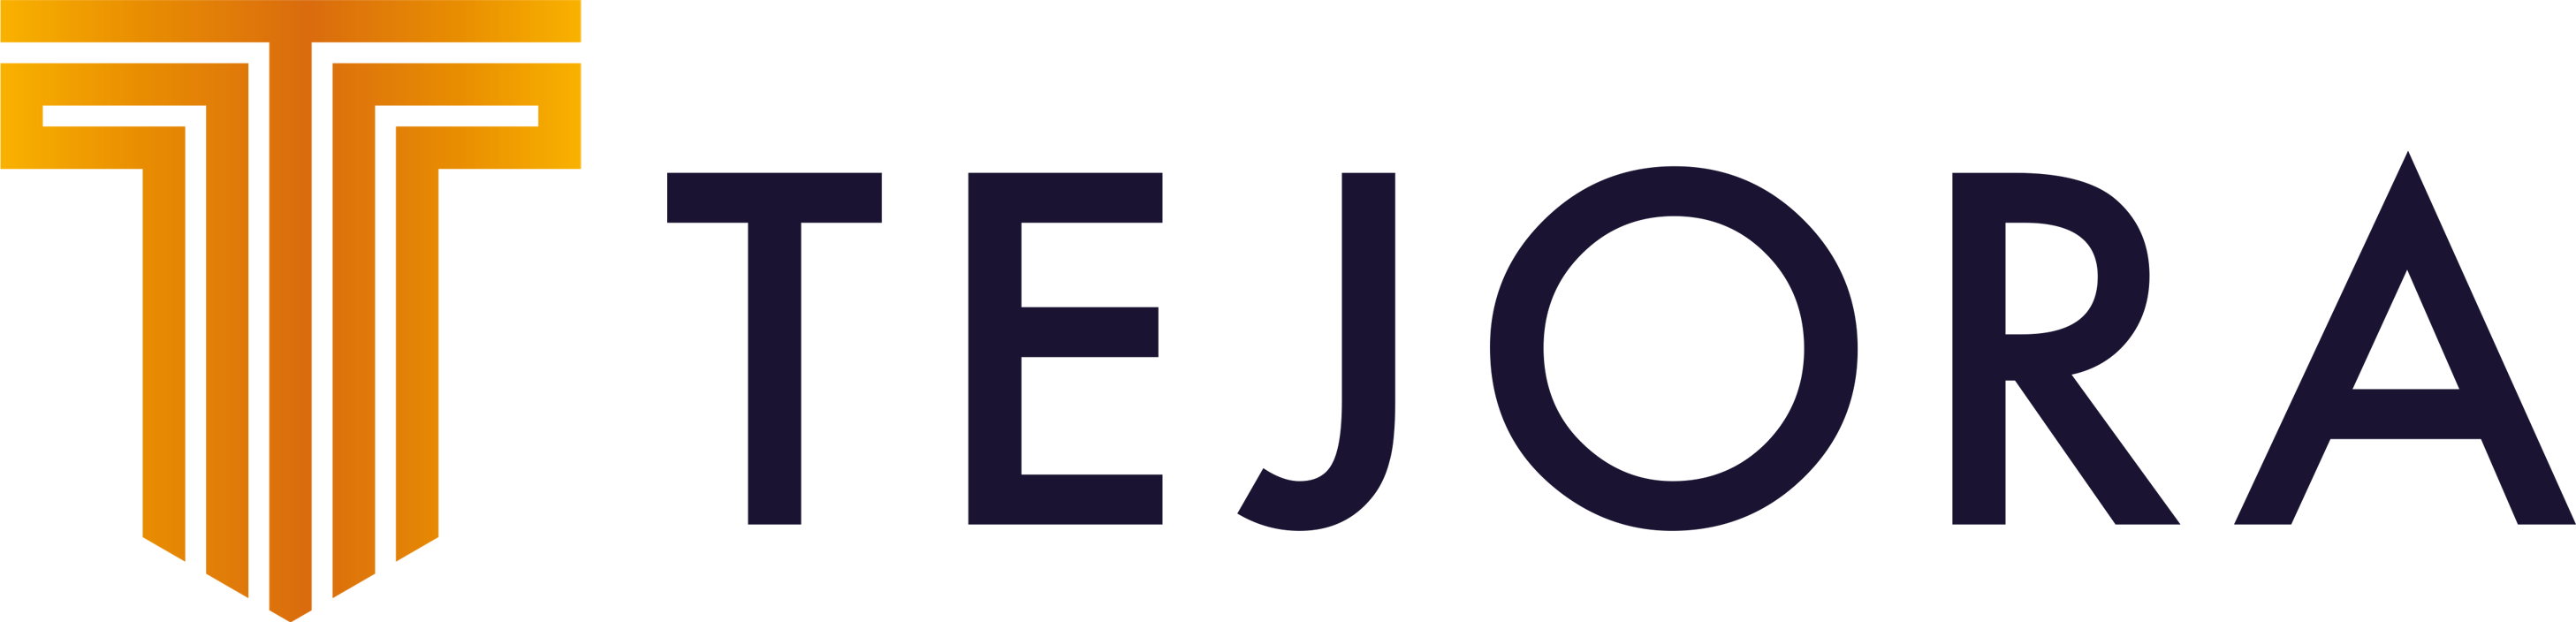 Tejora Private Limited Logo